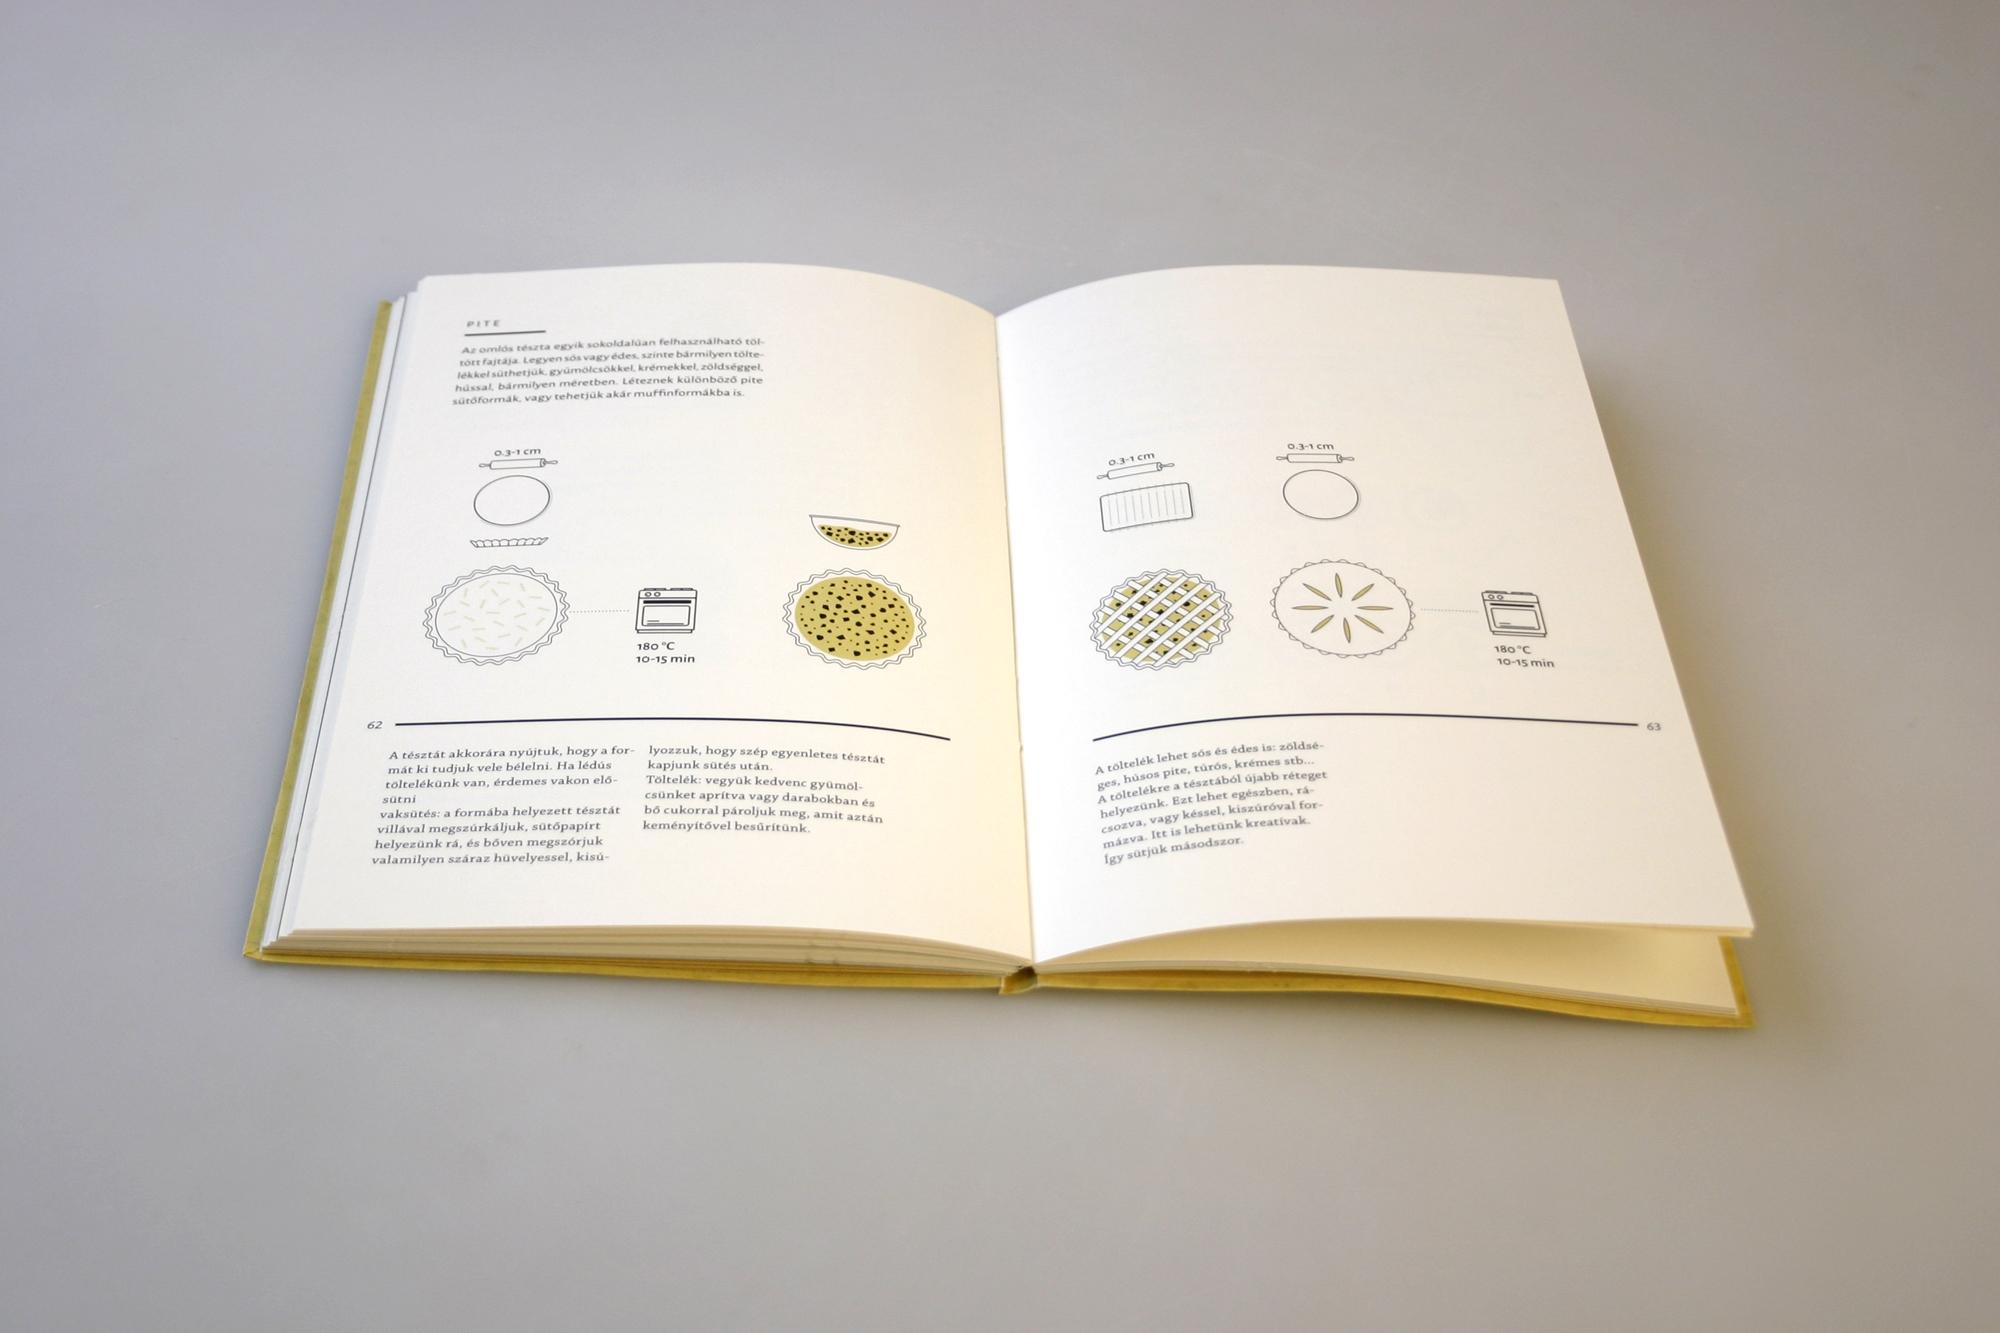 rosta emese receipt-book 02.jpg